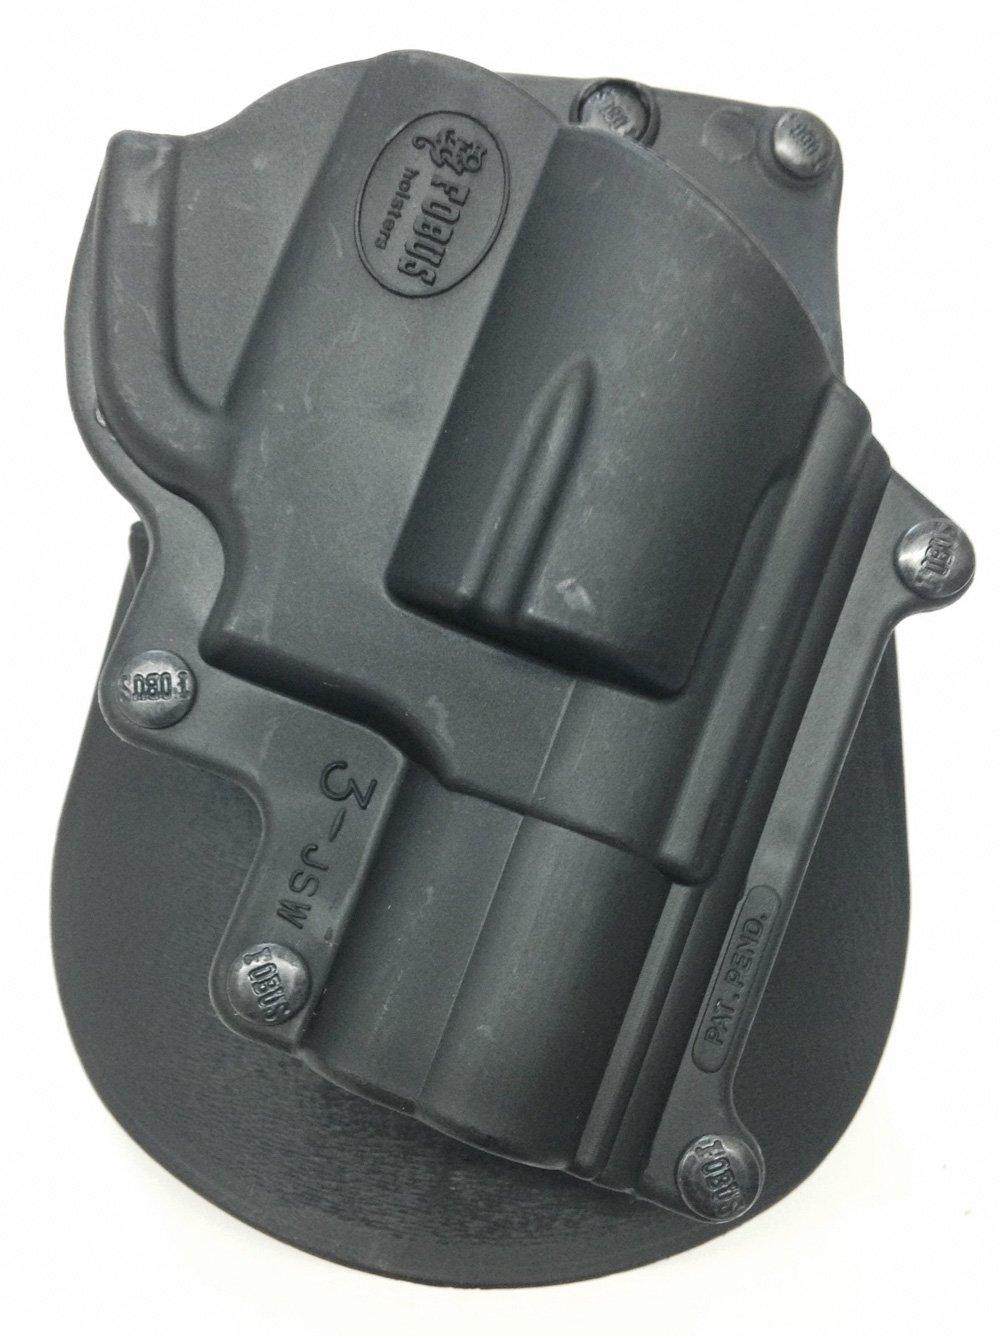 Fobus concealed carry Paddle Holster for S&W J frame Model 60 ...